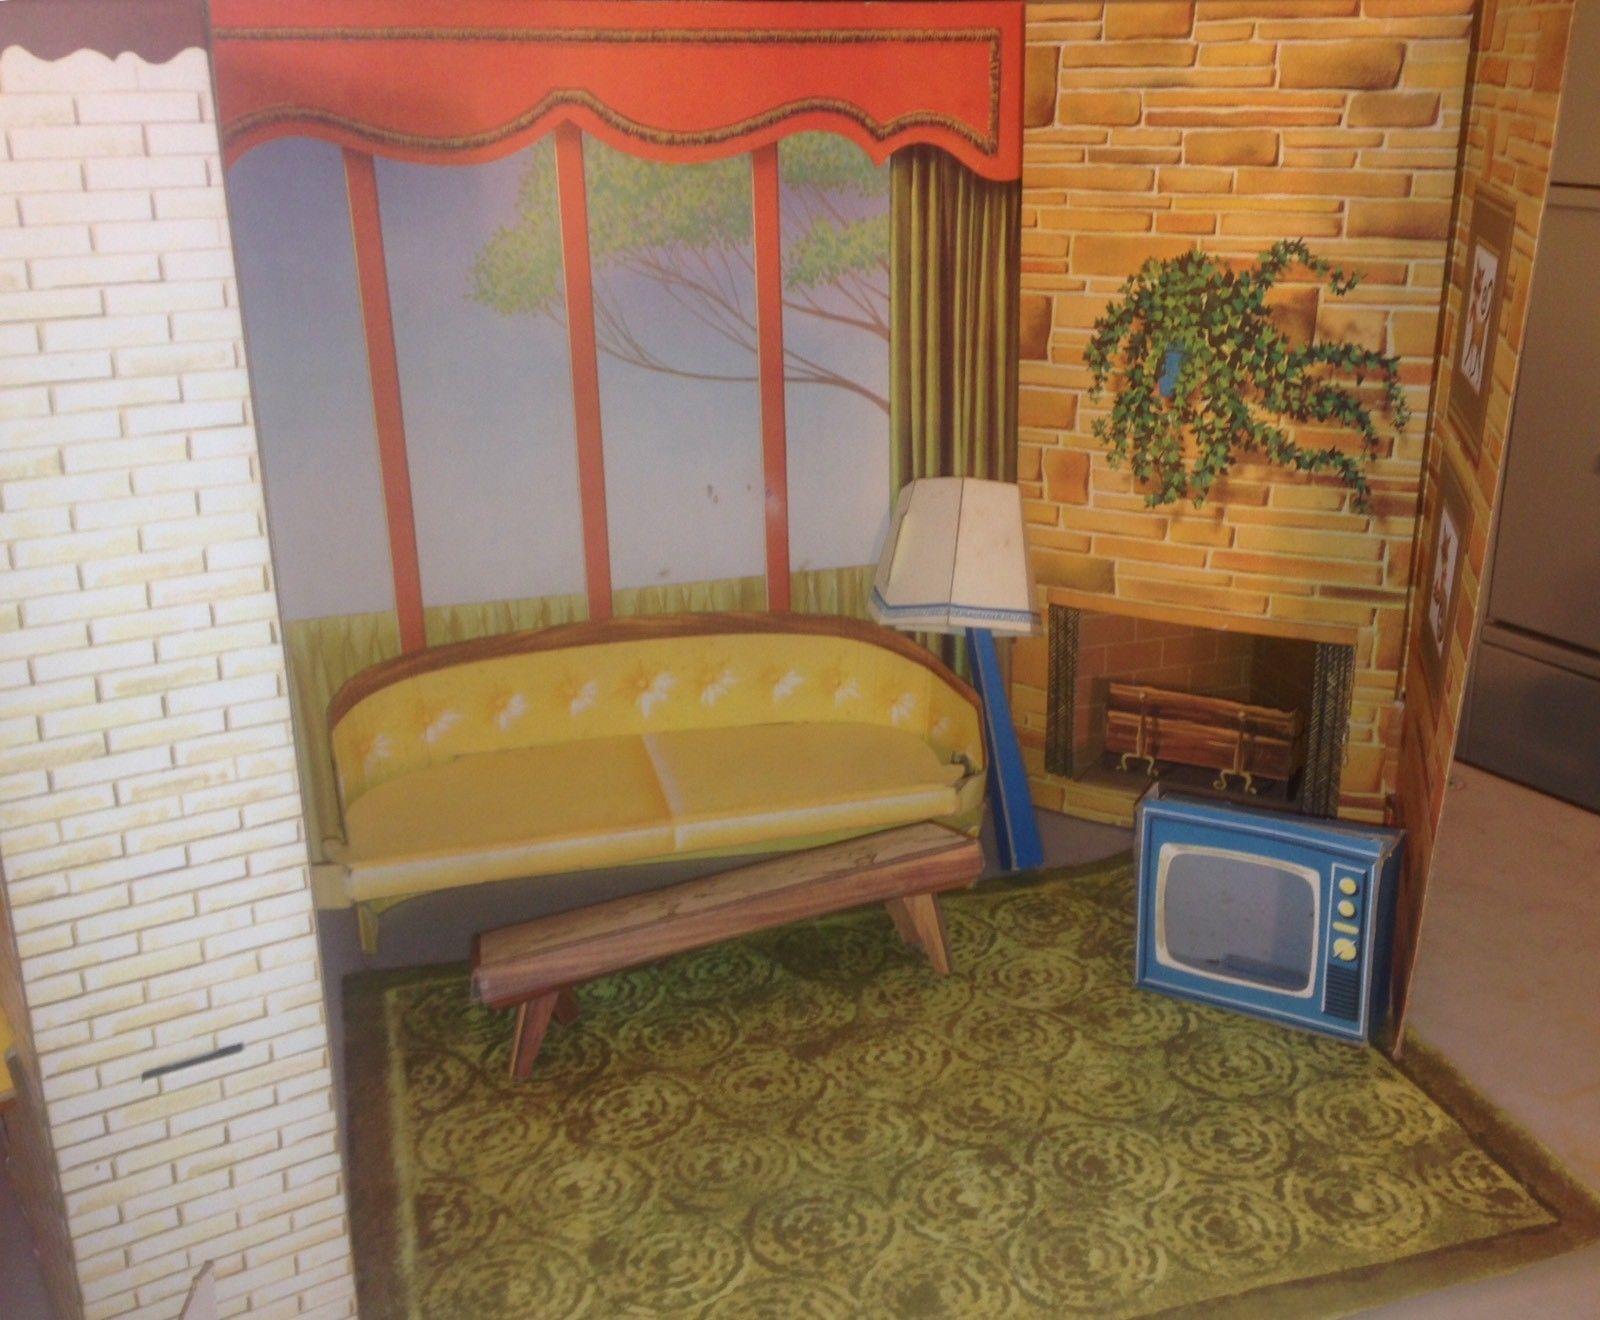 vintage 1963 barbie dream house by mattel cardboard doll house w